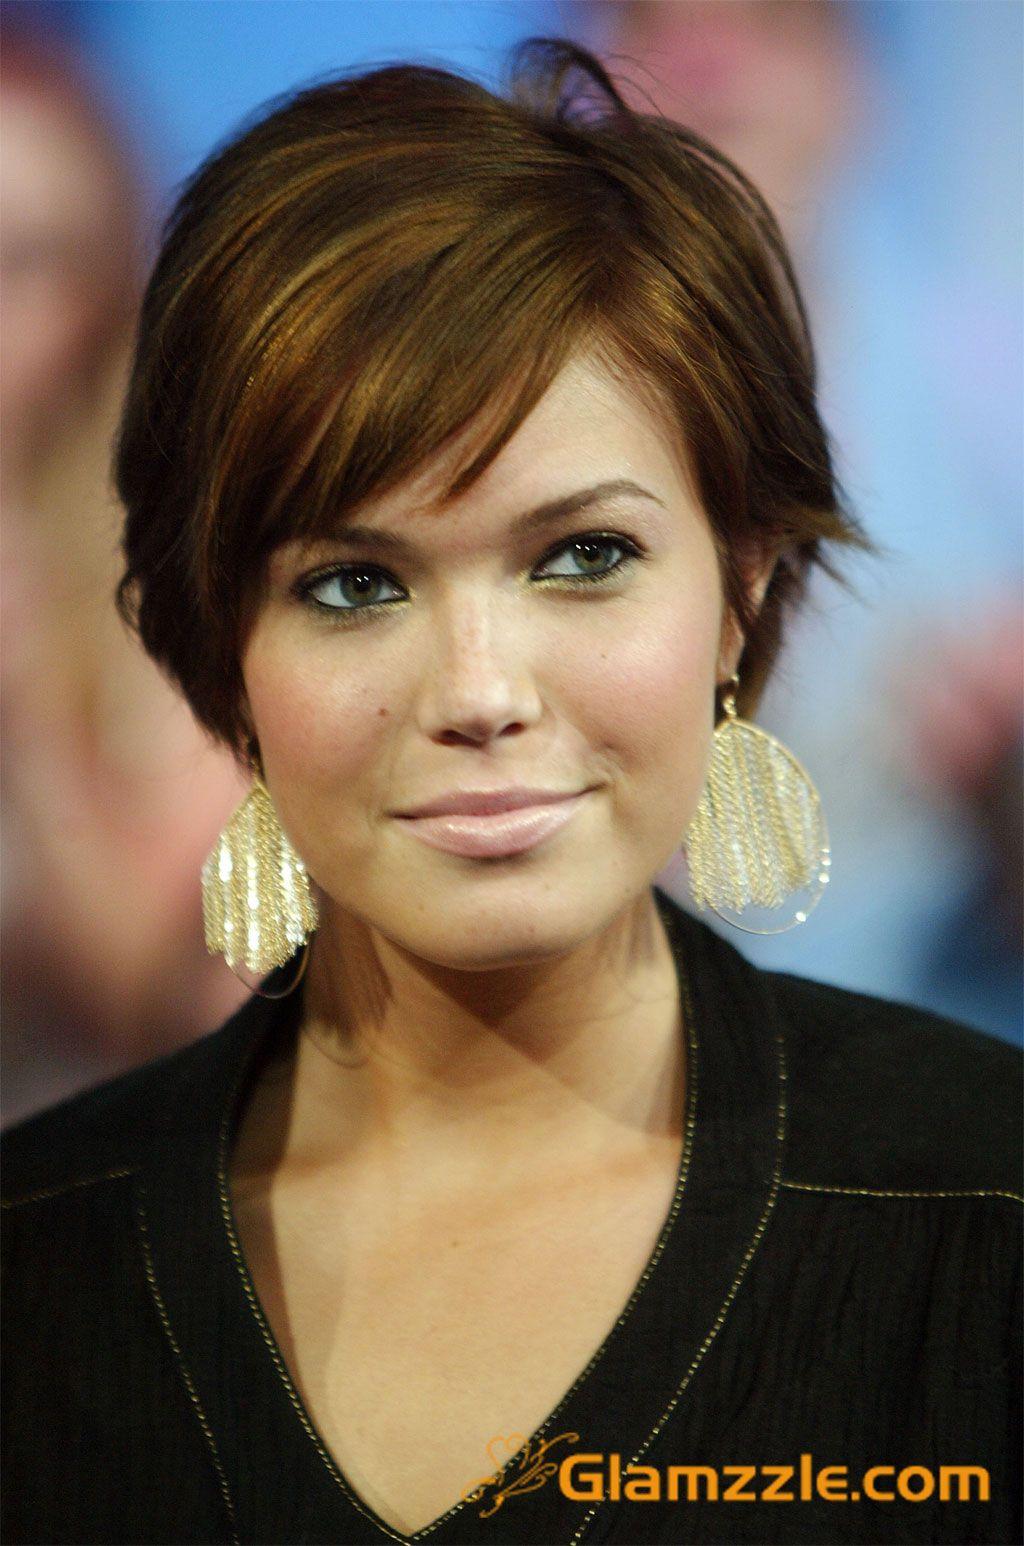 Mandy Moore Should Never Be Allowed To Grow Out Her Hair Short Bob Haircut 2012 Potongan Rambut Pendek Potongan Rambut Sedang Ide Potongan Rambut